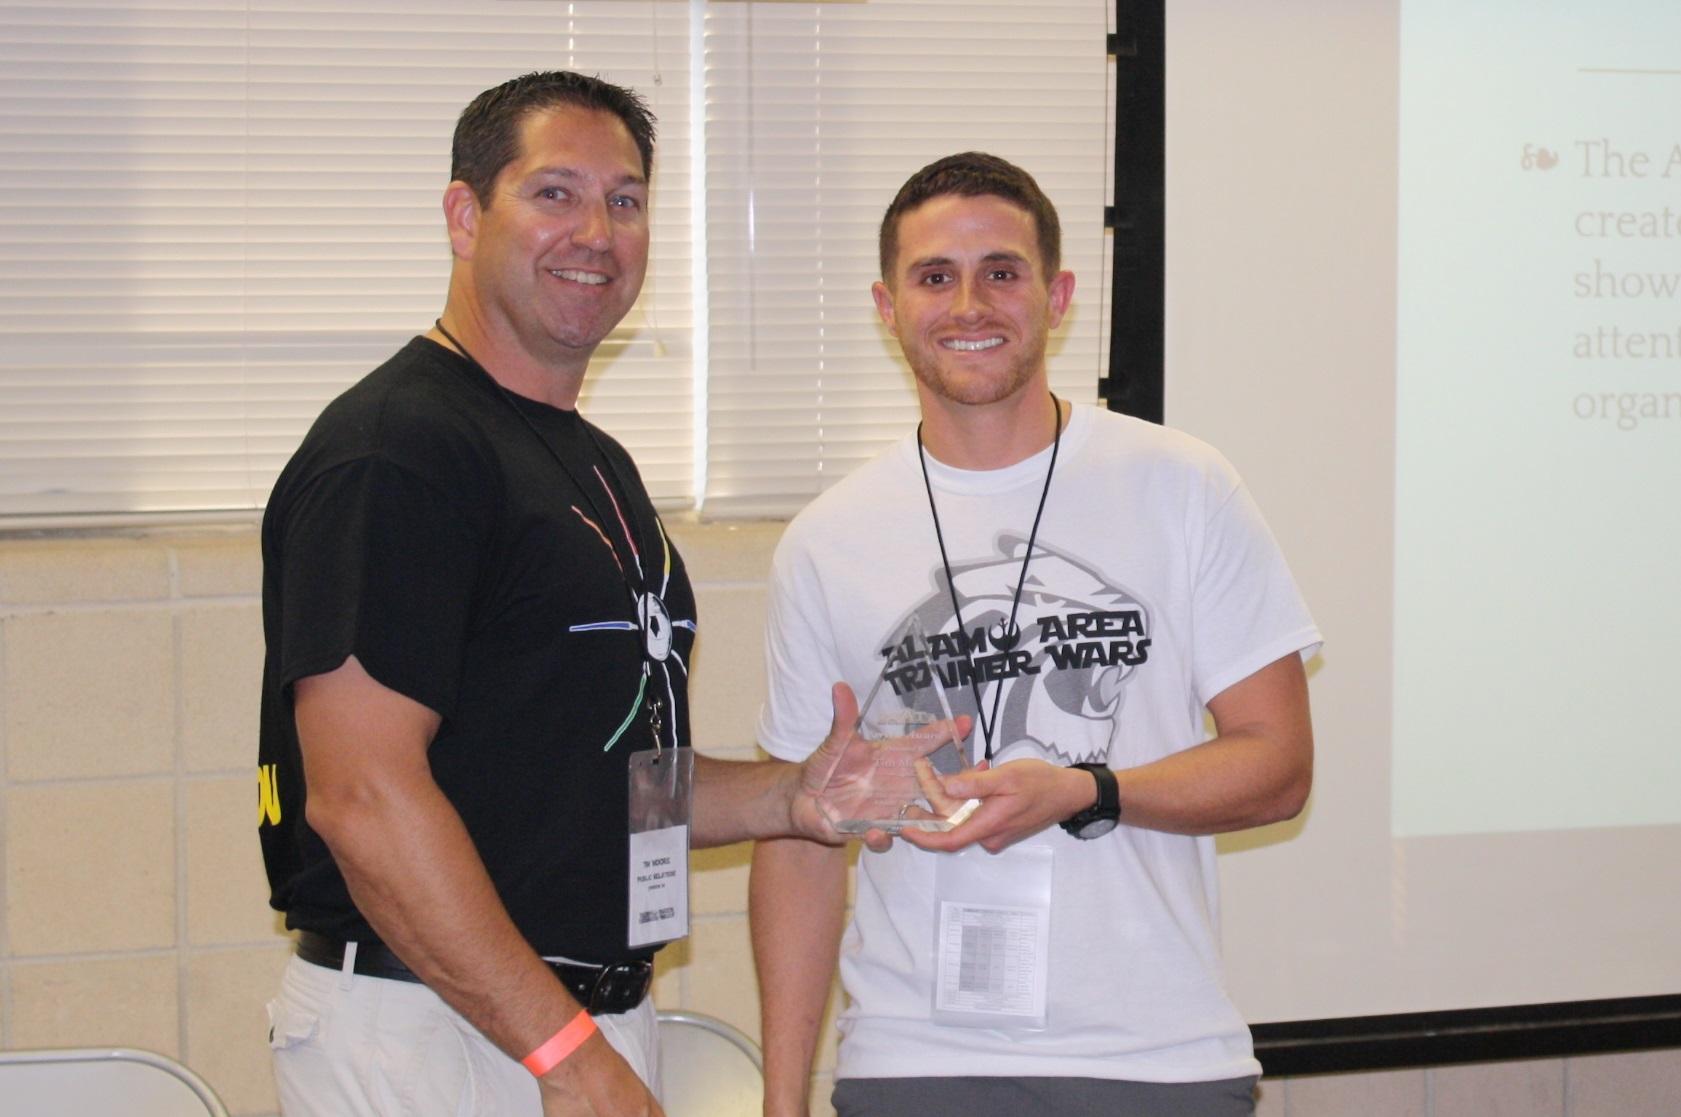 Moore - Service Award 2016